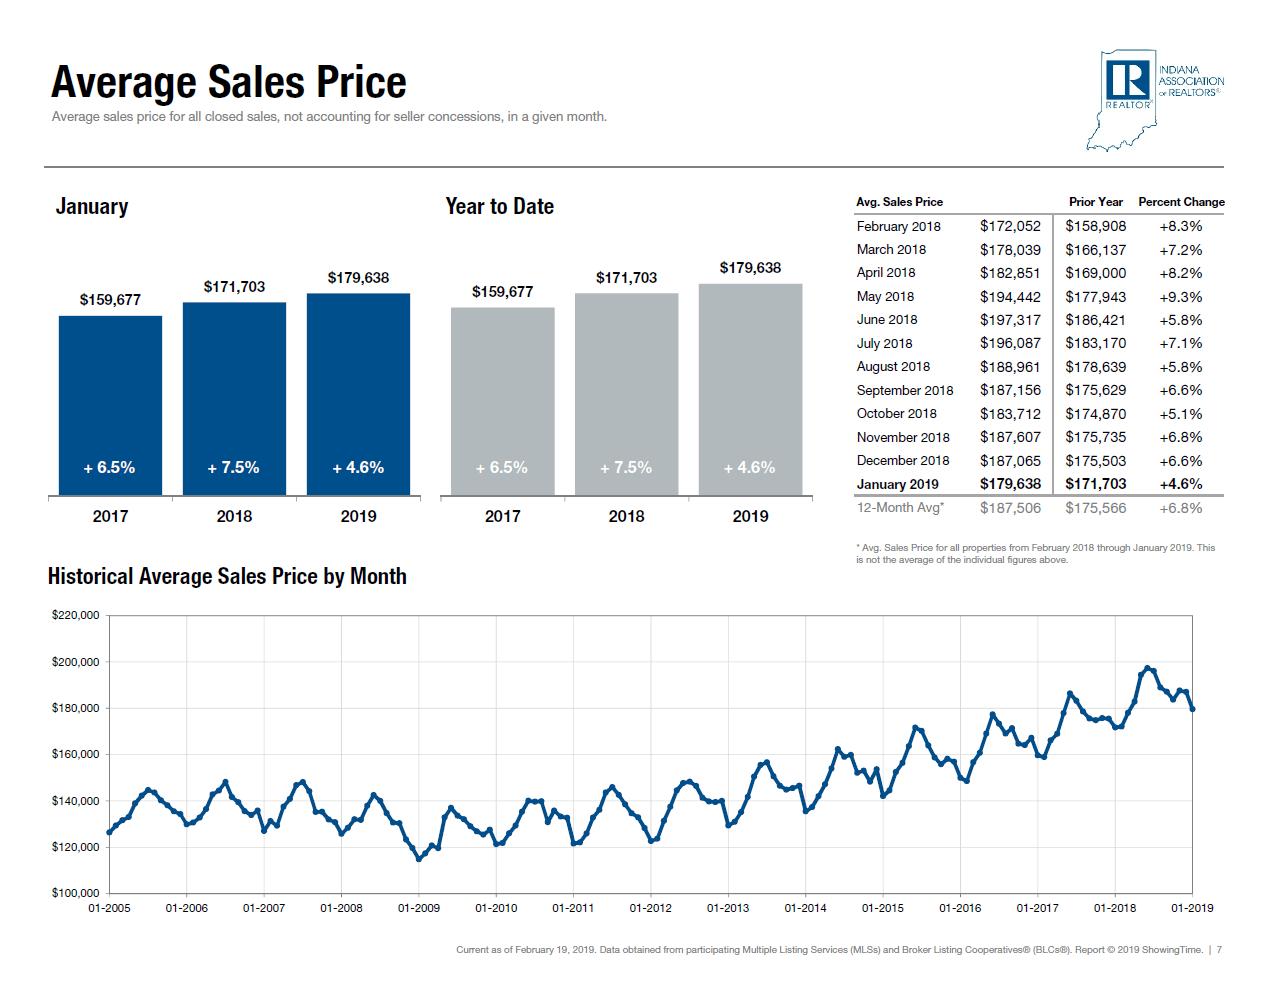 Average Fort Wayne Indiana Property Sales Price from Fort Wayne Real Estate Investors Association meeting